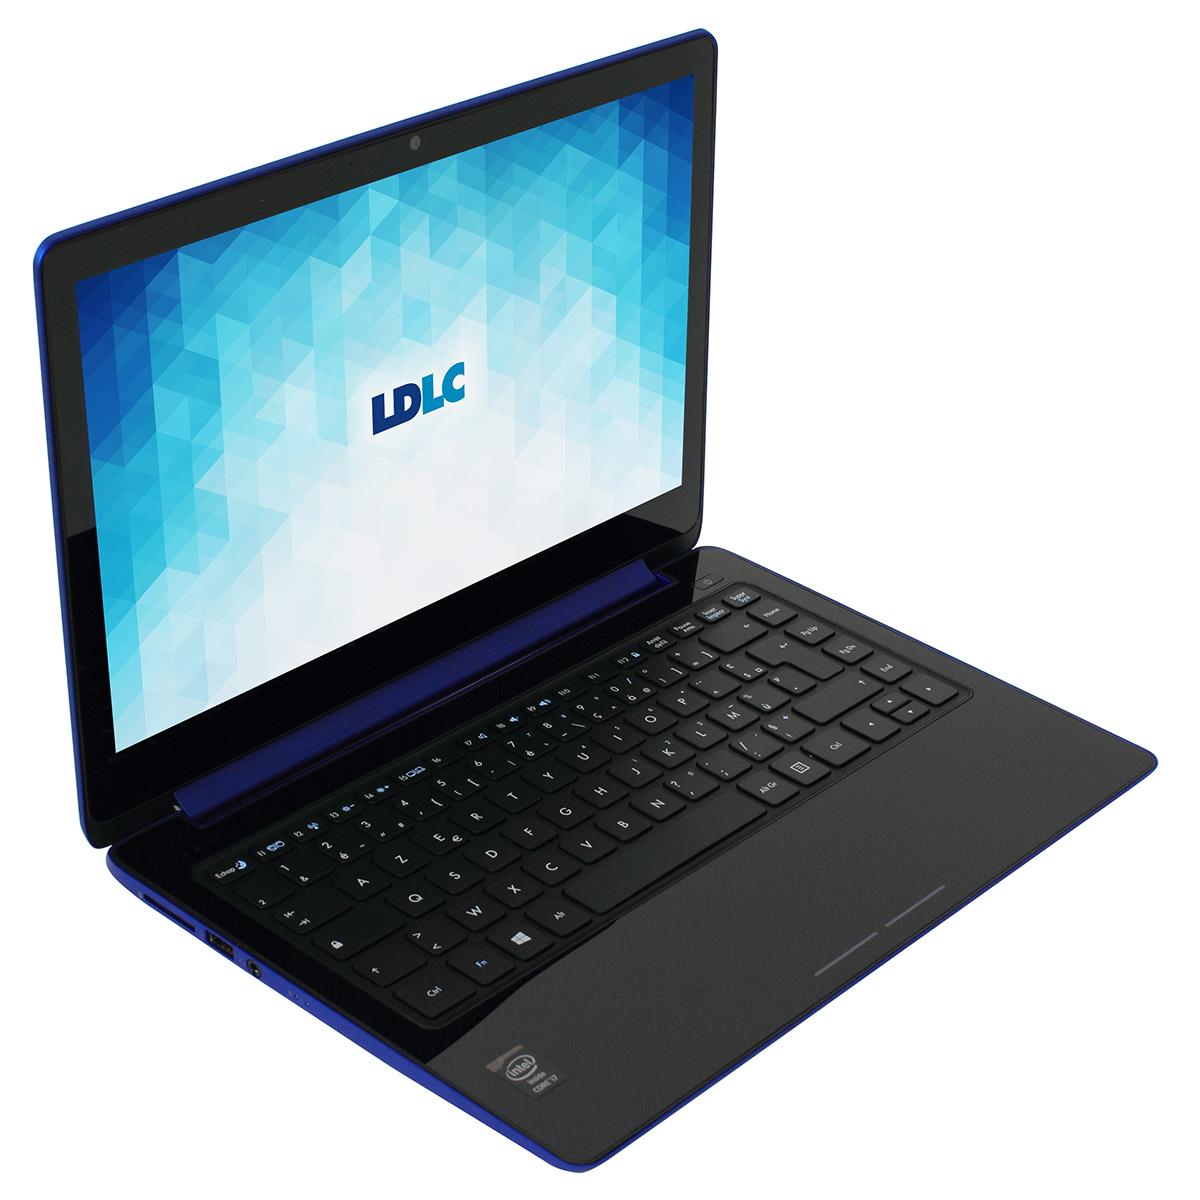 "PC portable LDLC Iris FB2-I7-8-S2 UltraSlim Intel Core i7-4500U 8 Go SSD 256 Go 13.3"" LED QHD Tactile Wi-Fi N/Bluetooth 4.0 Webcam (sans OS)"